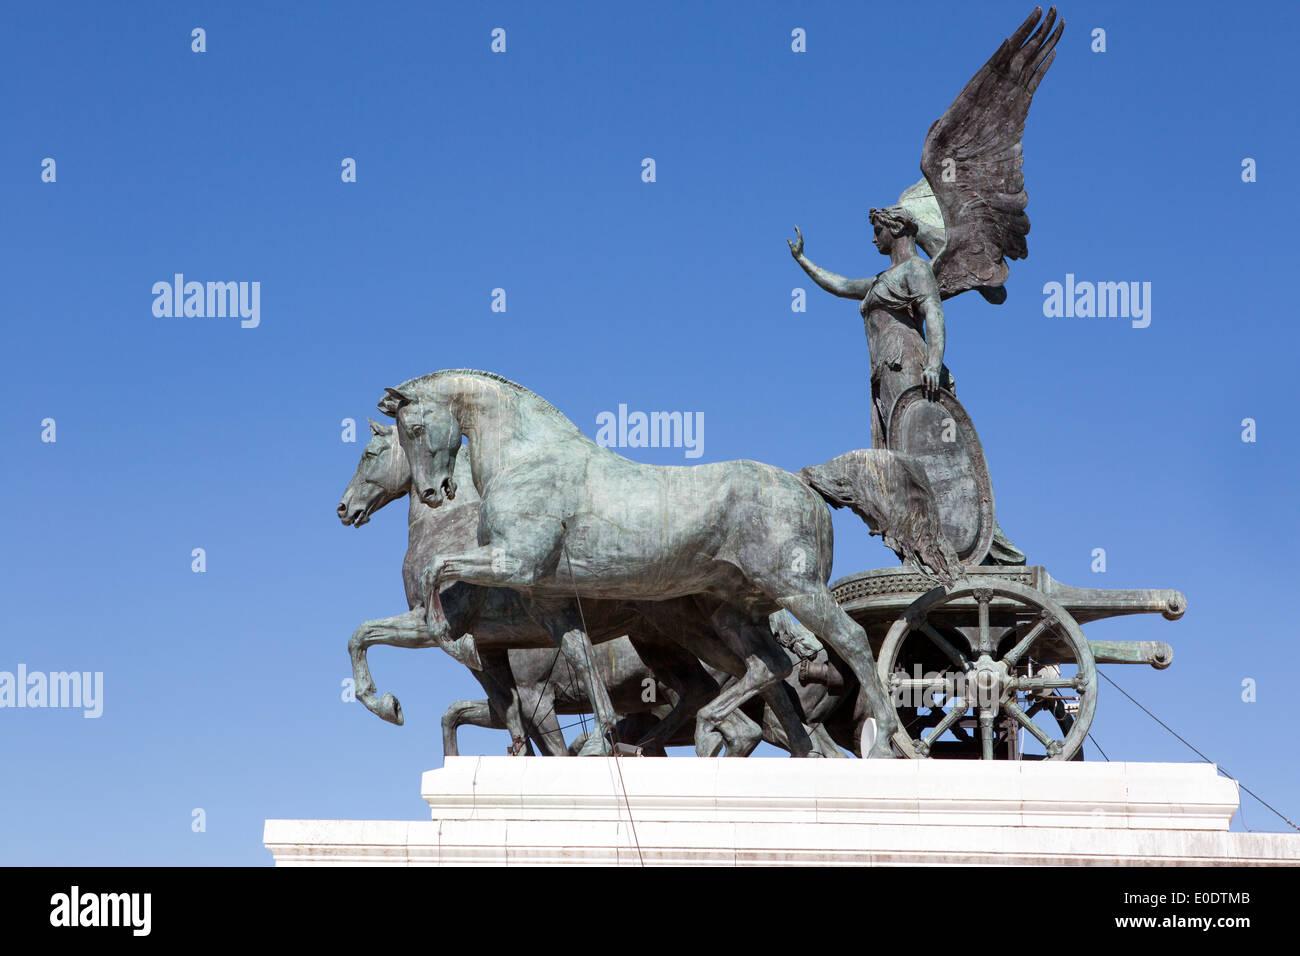 Sculpture sur le Vittoriano, Rome, Italie Photo Stock